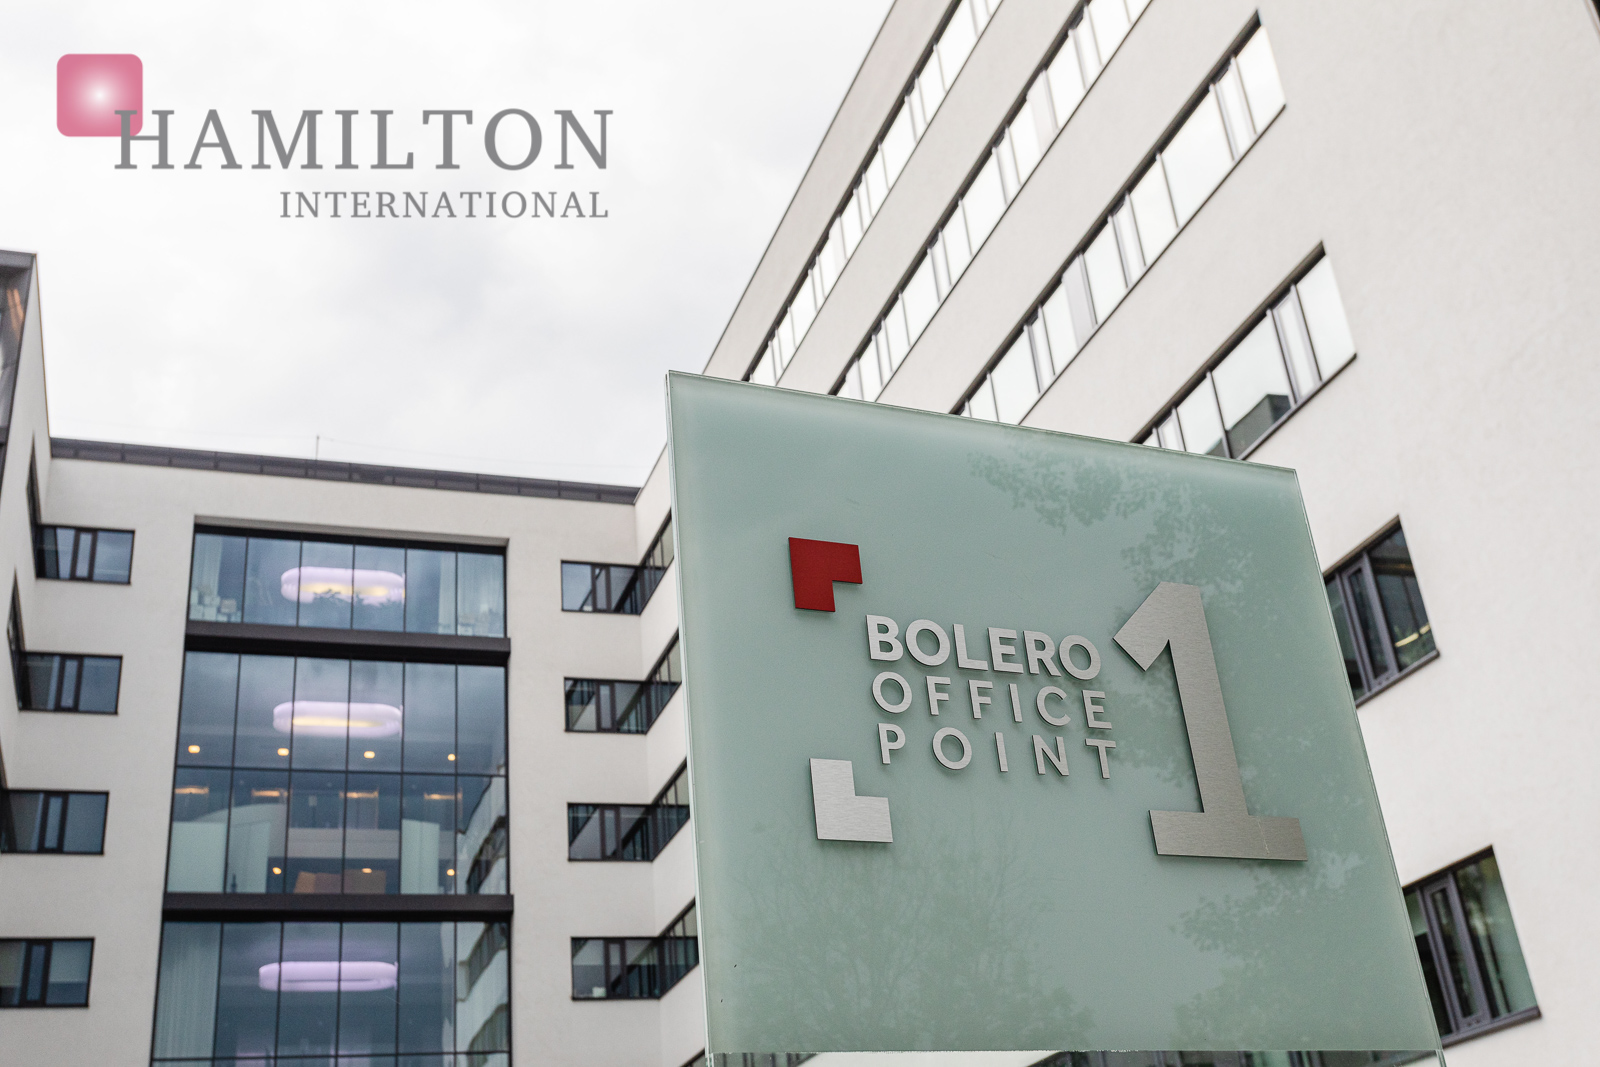 Bolero Office Point 1 Warsaw office building photo